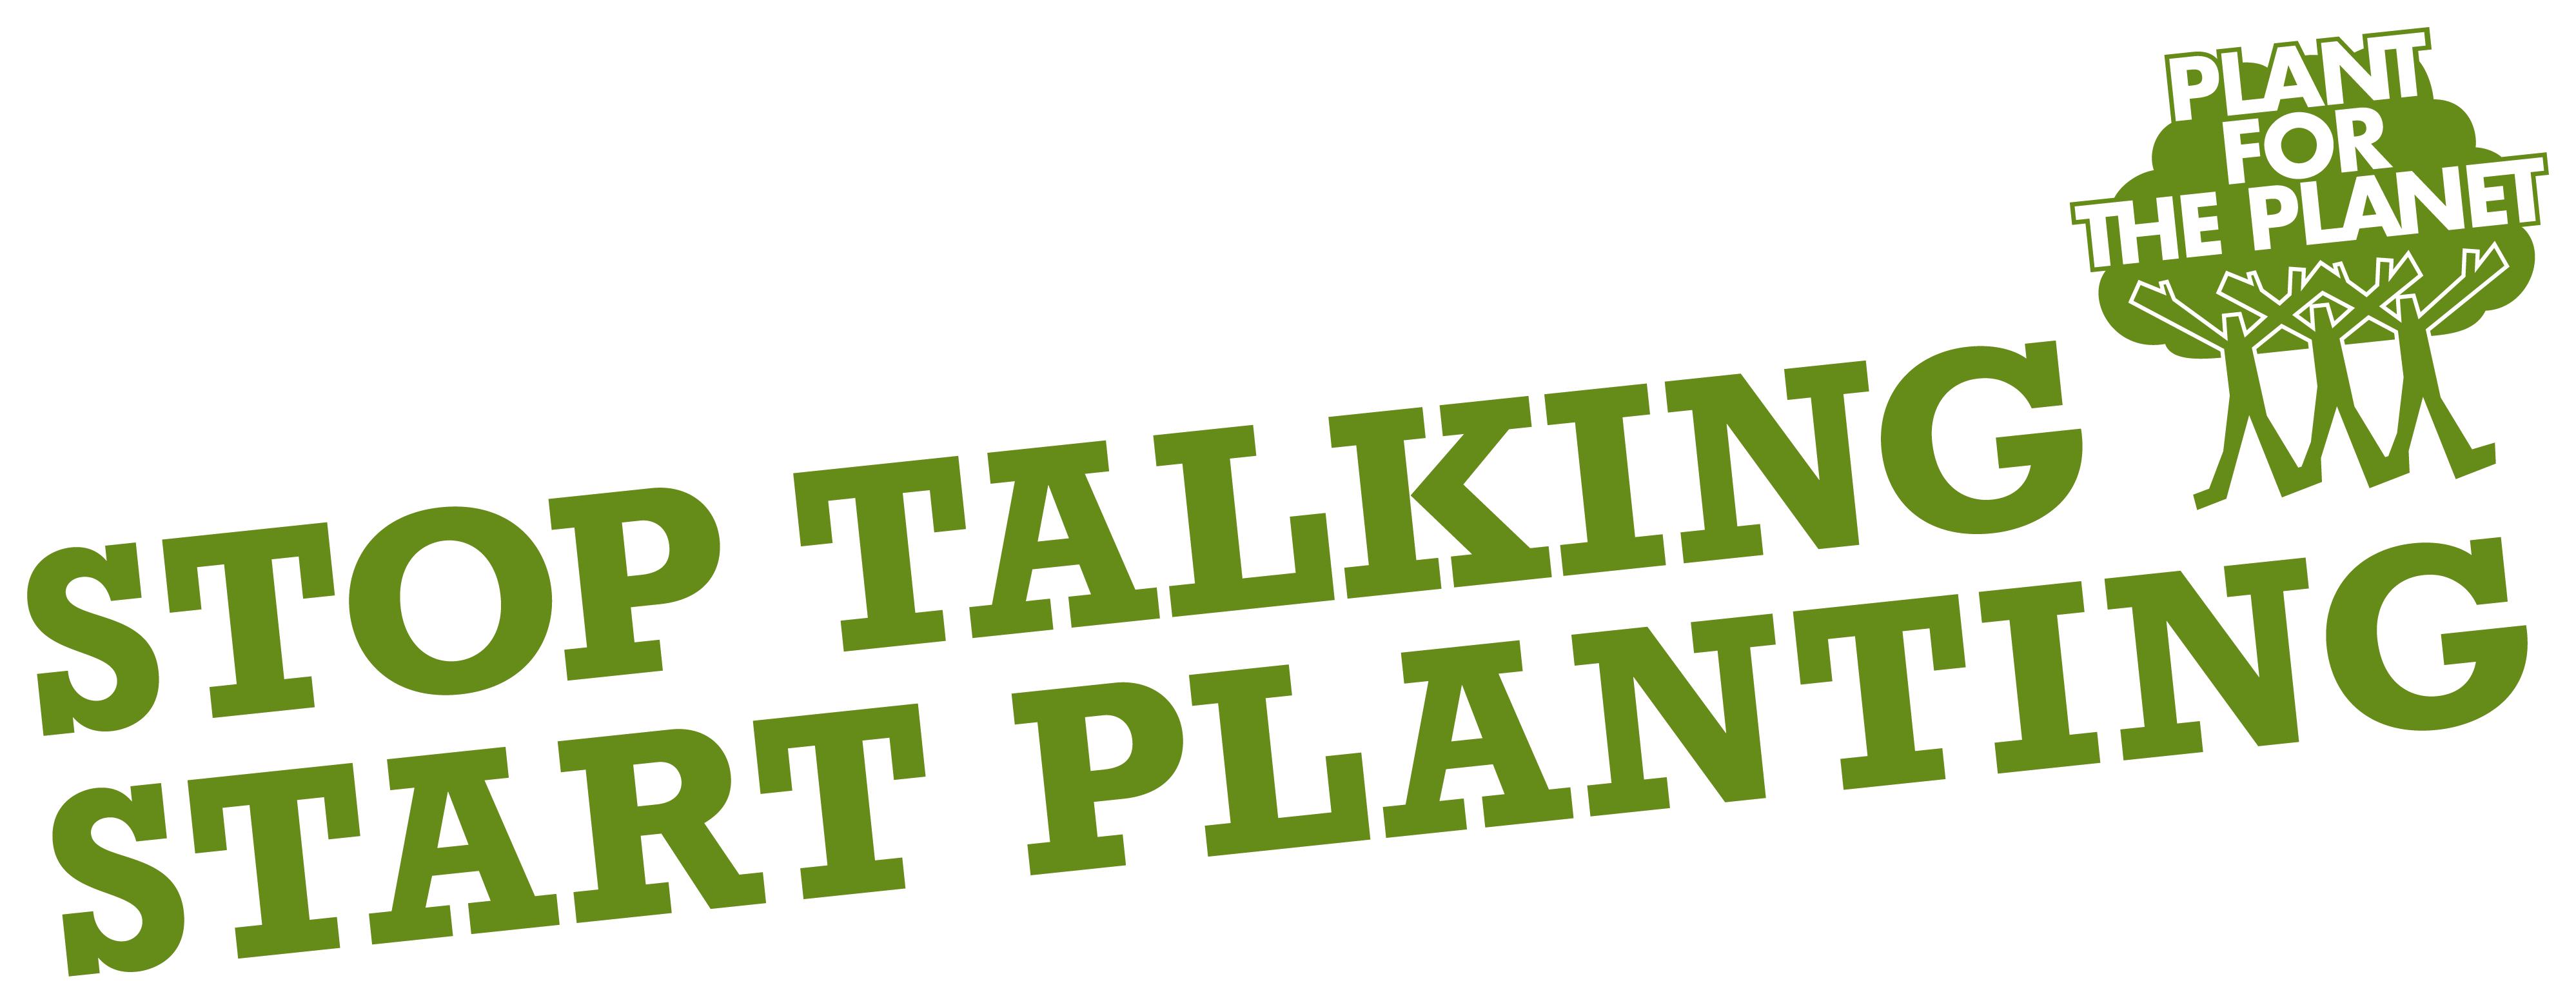 stoptalking,startplanting